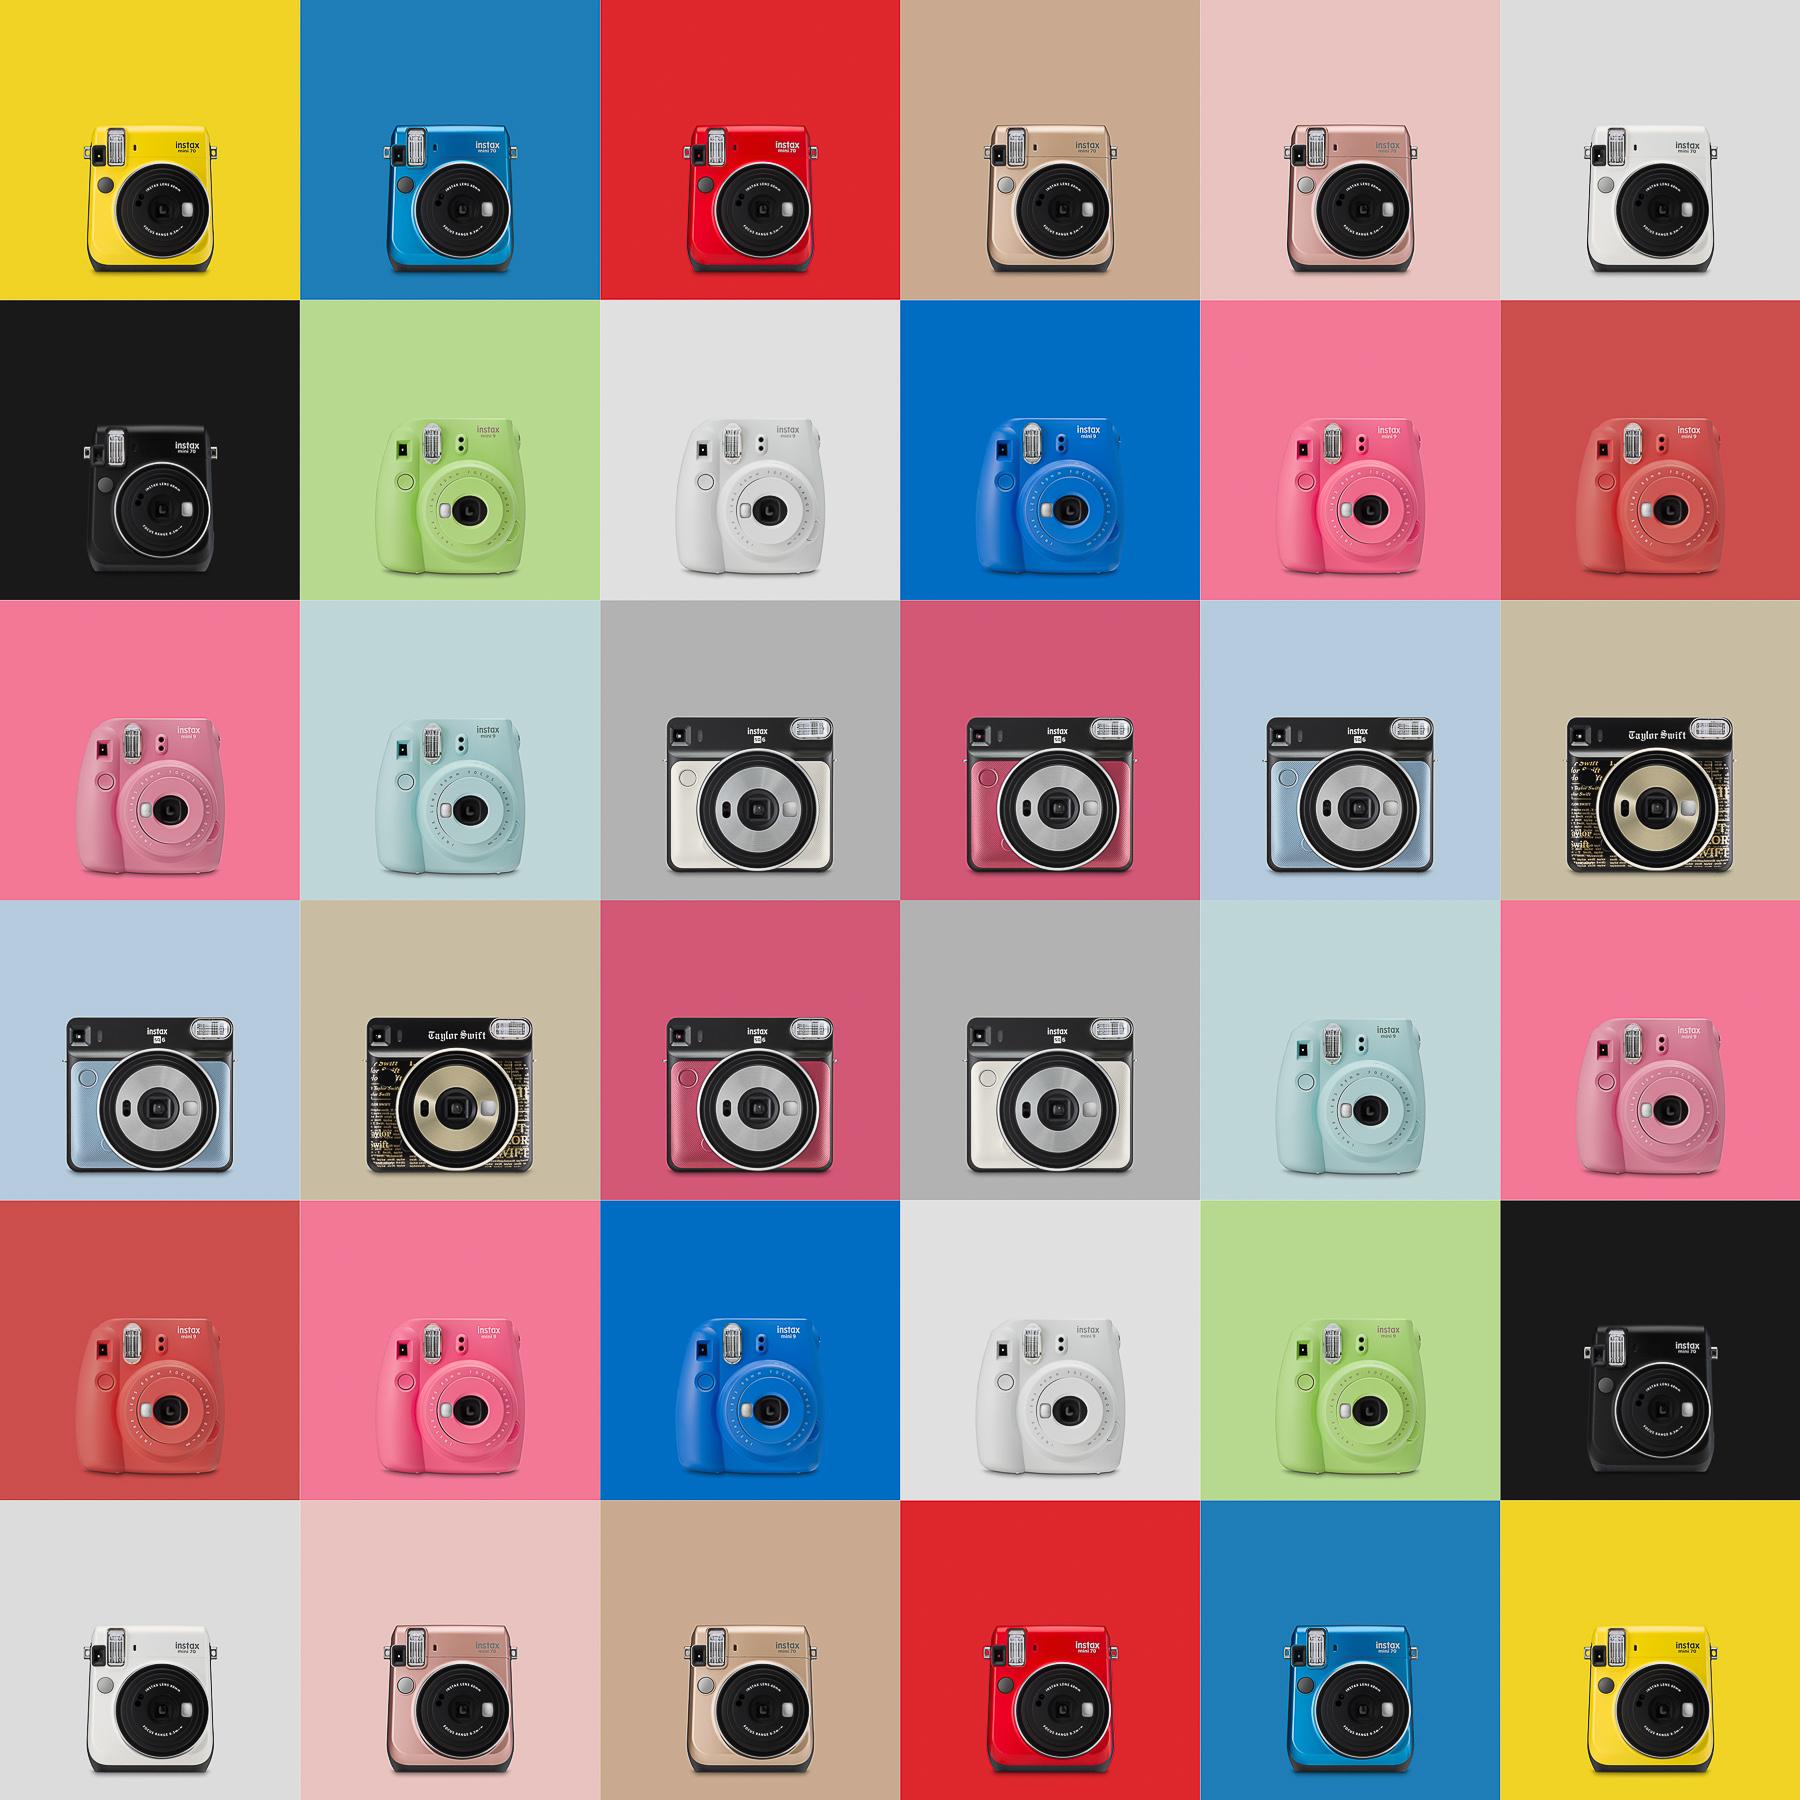 Fujifilm Instax Colour Photography